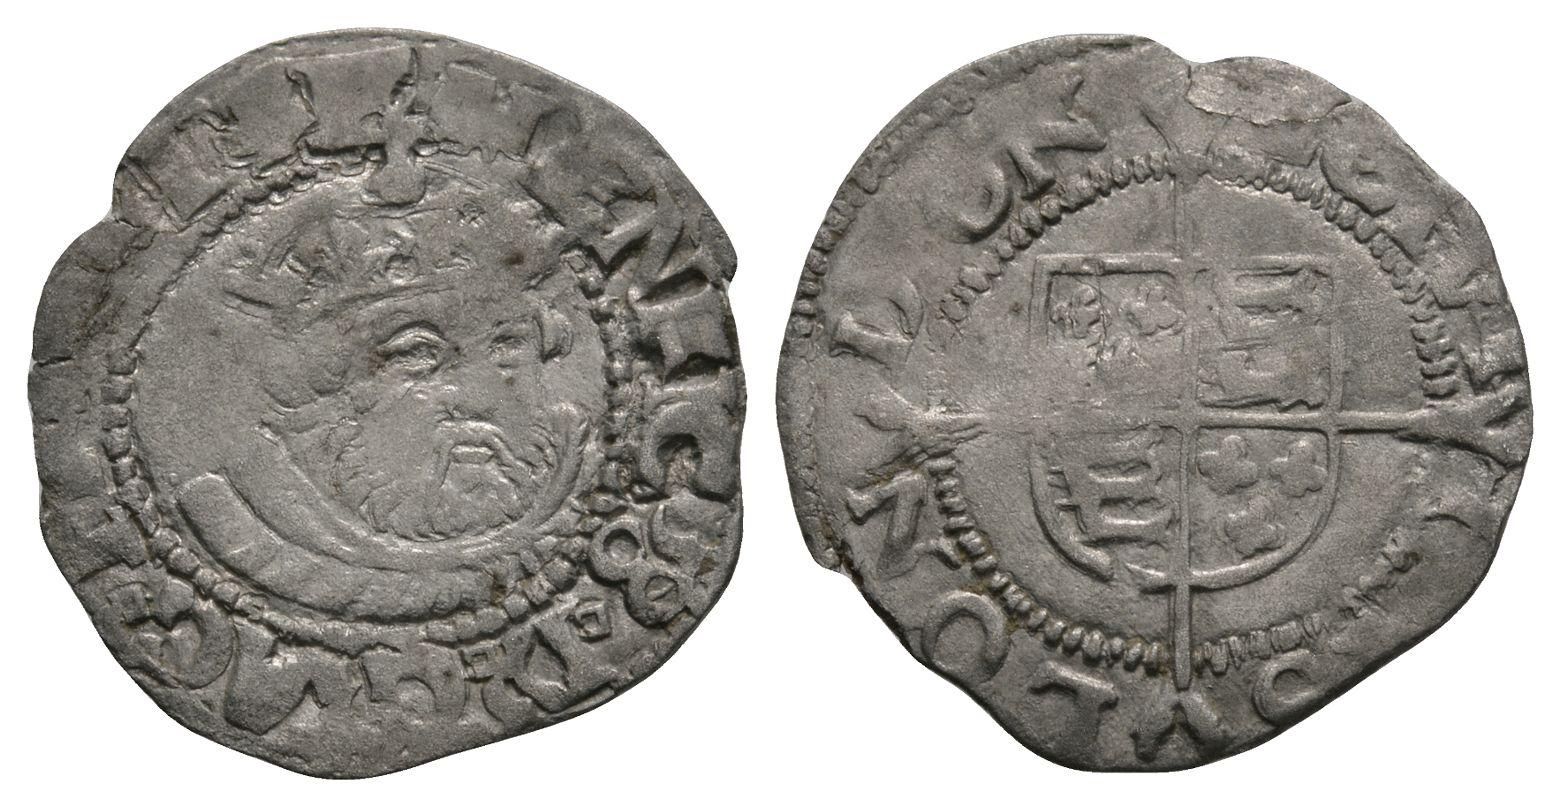 English Tudor Coins - Edward VI (in name of Henry VIII) - Southwark - Facing Bust Halfgroat